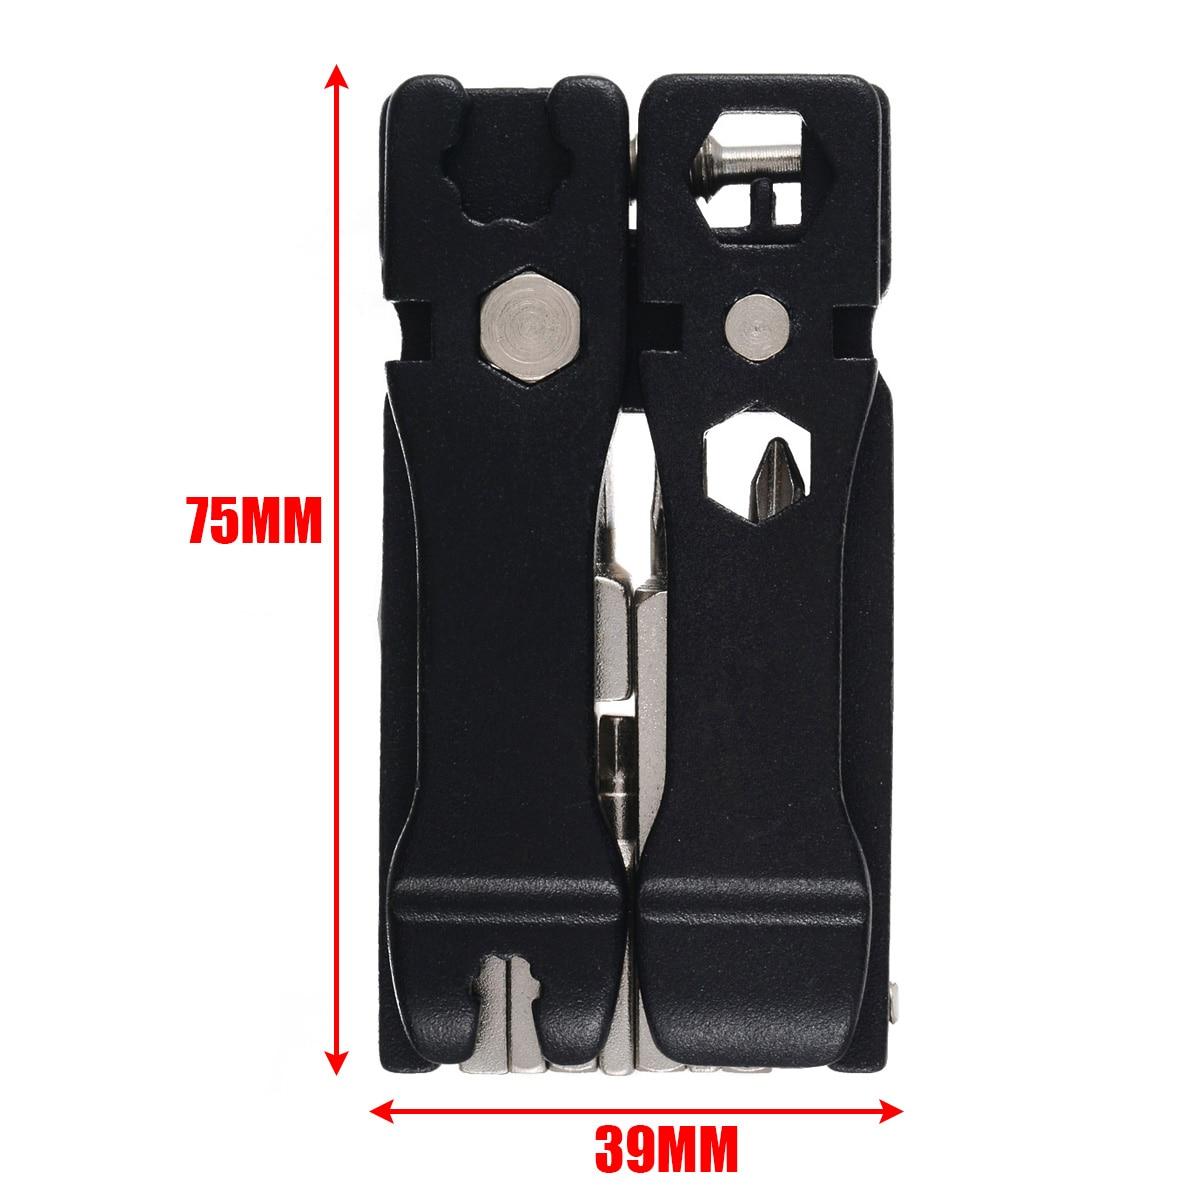 Mayitr 1 set  19 in 1 Mini Repair Pocket Folding Tool Bicycle Repair Multitool Folding Tool Repair Kit Wrench Sets